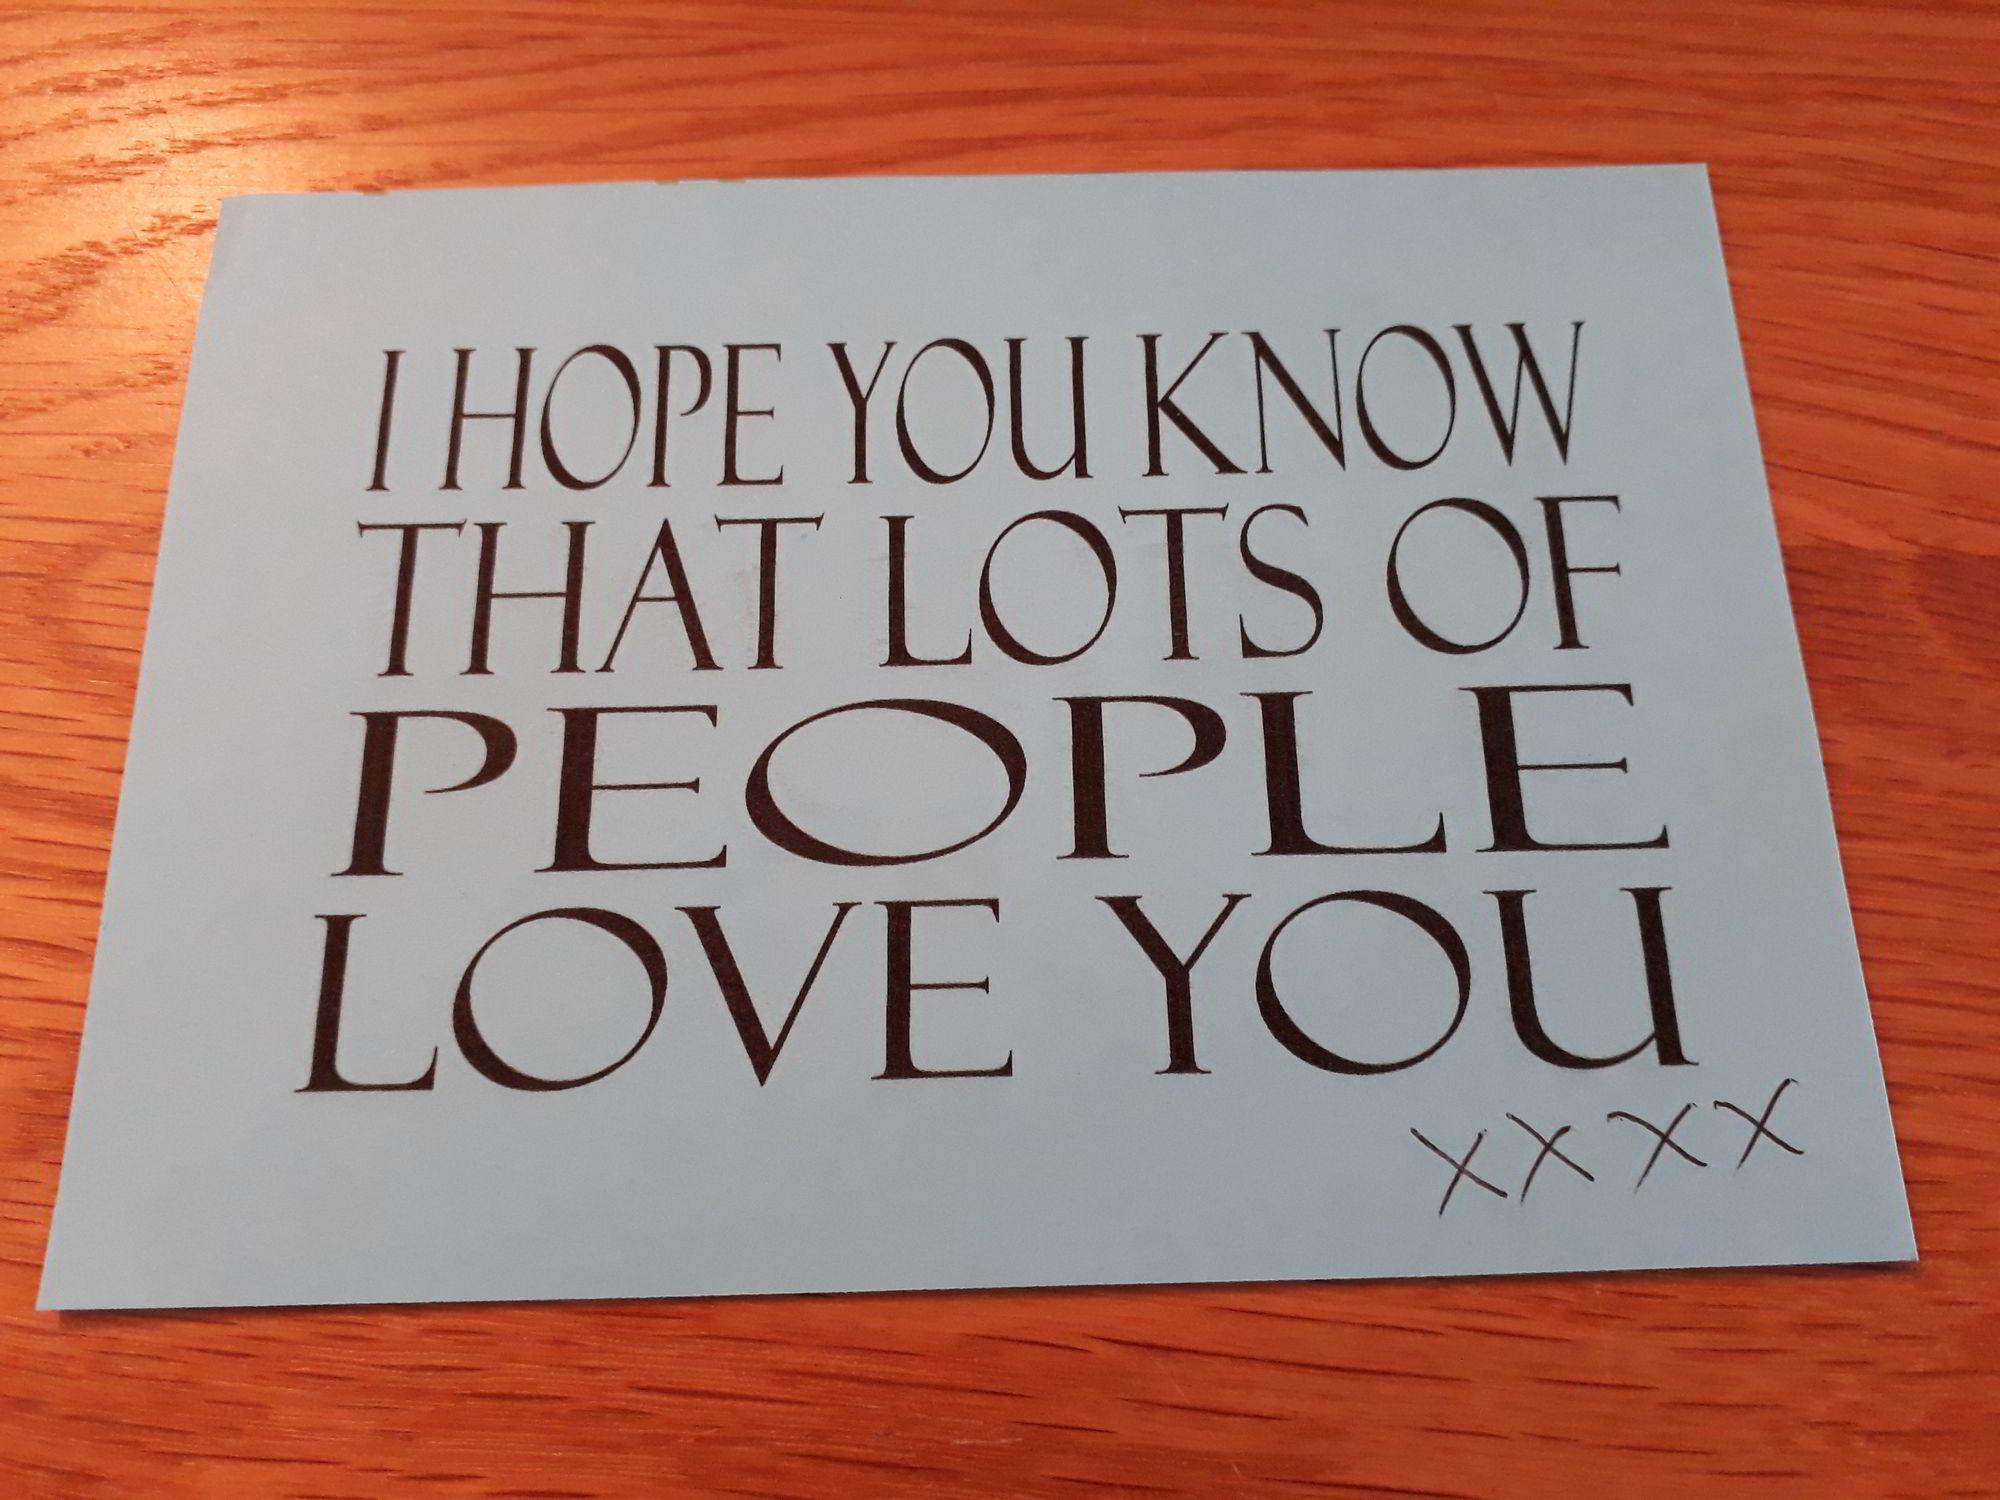 The Wonderful Card from Mirren